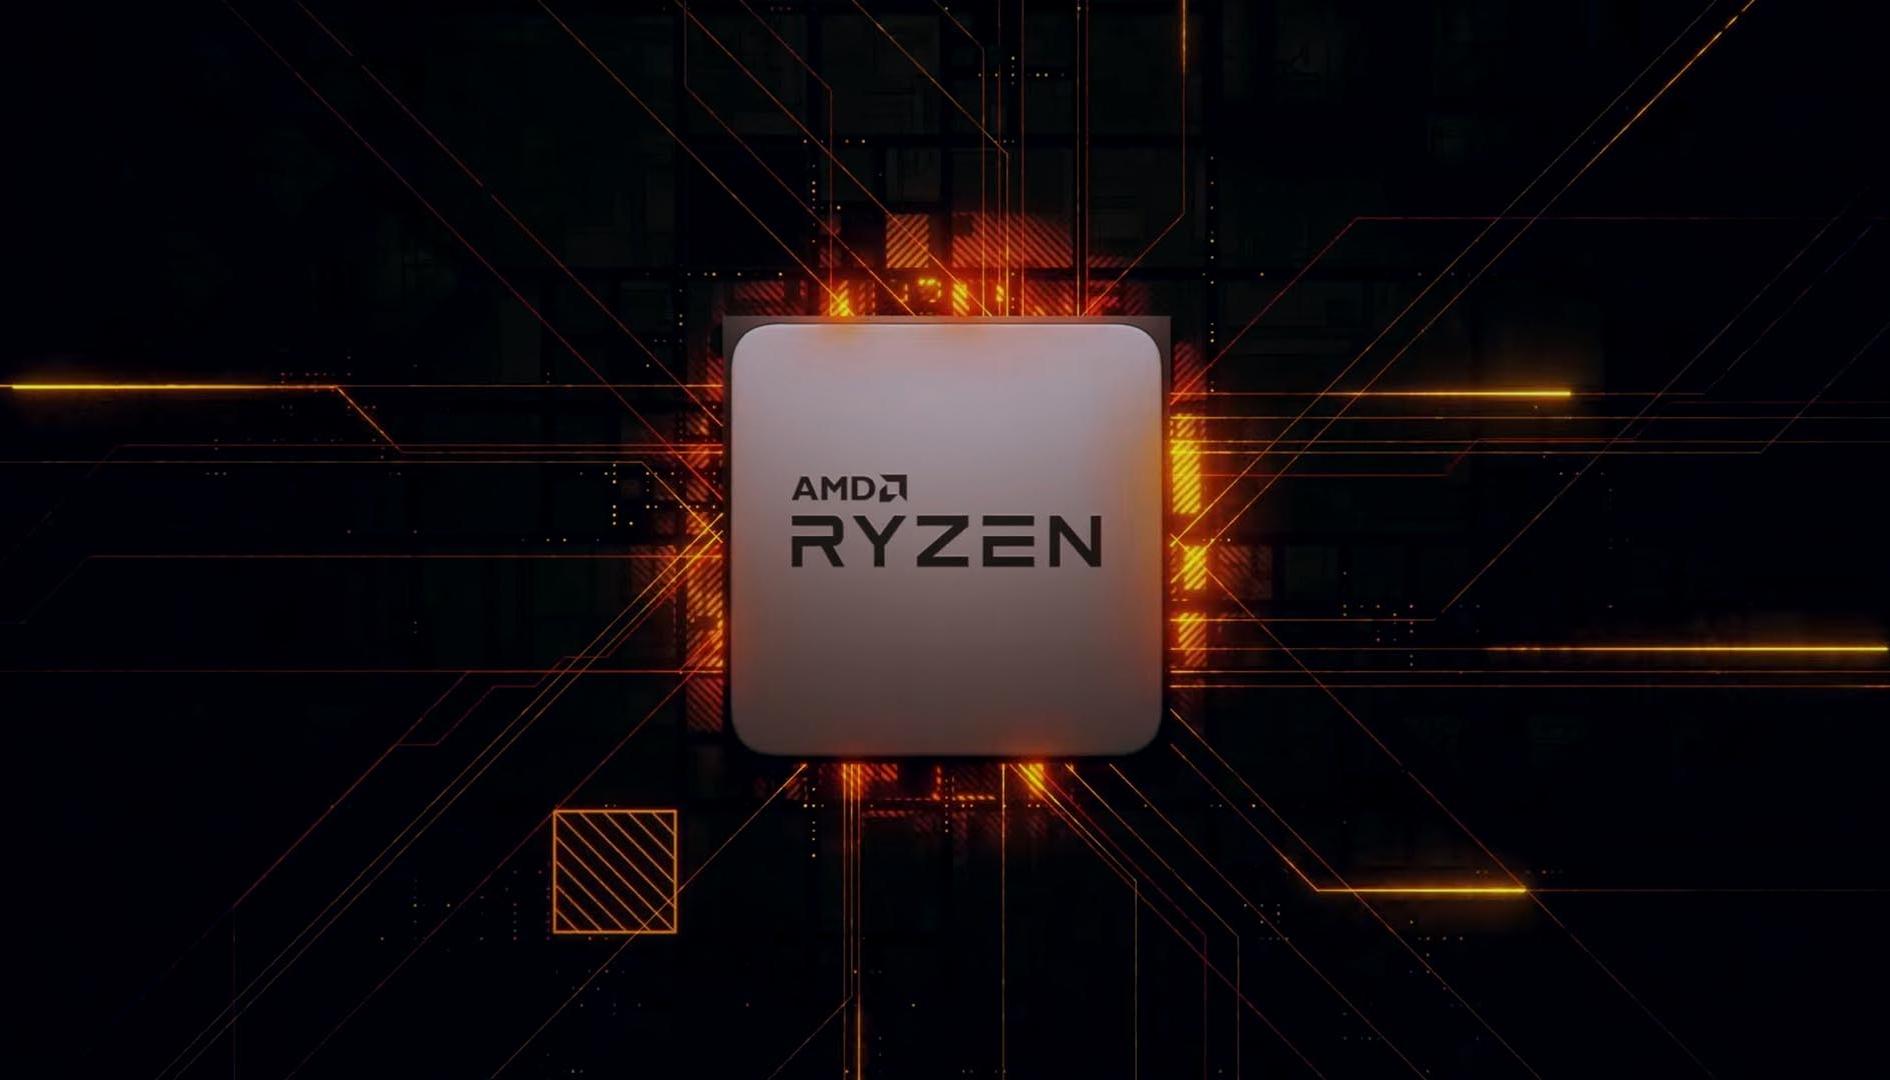 Il Ryzen 5 4500U di AMD supera il Core i7-10710U su Geekbench